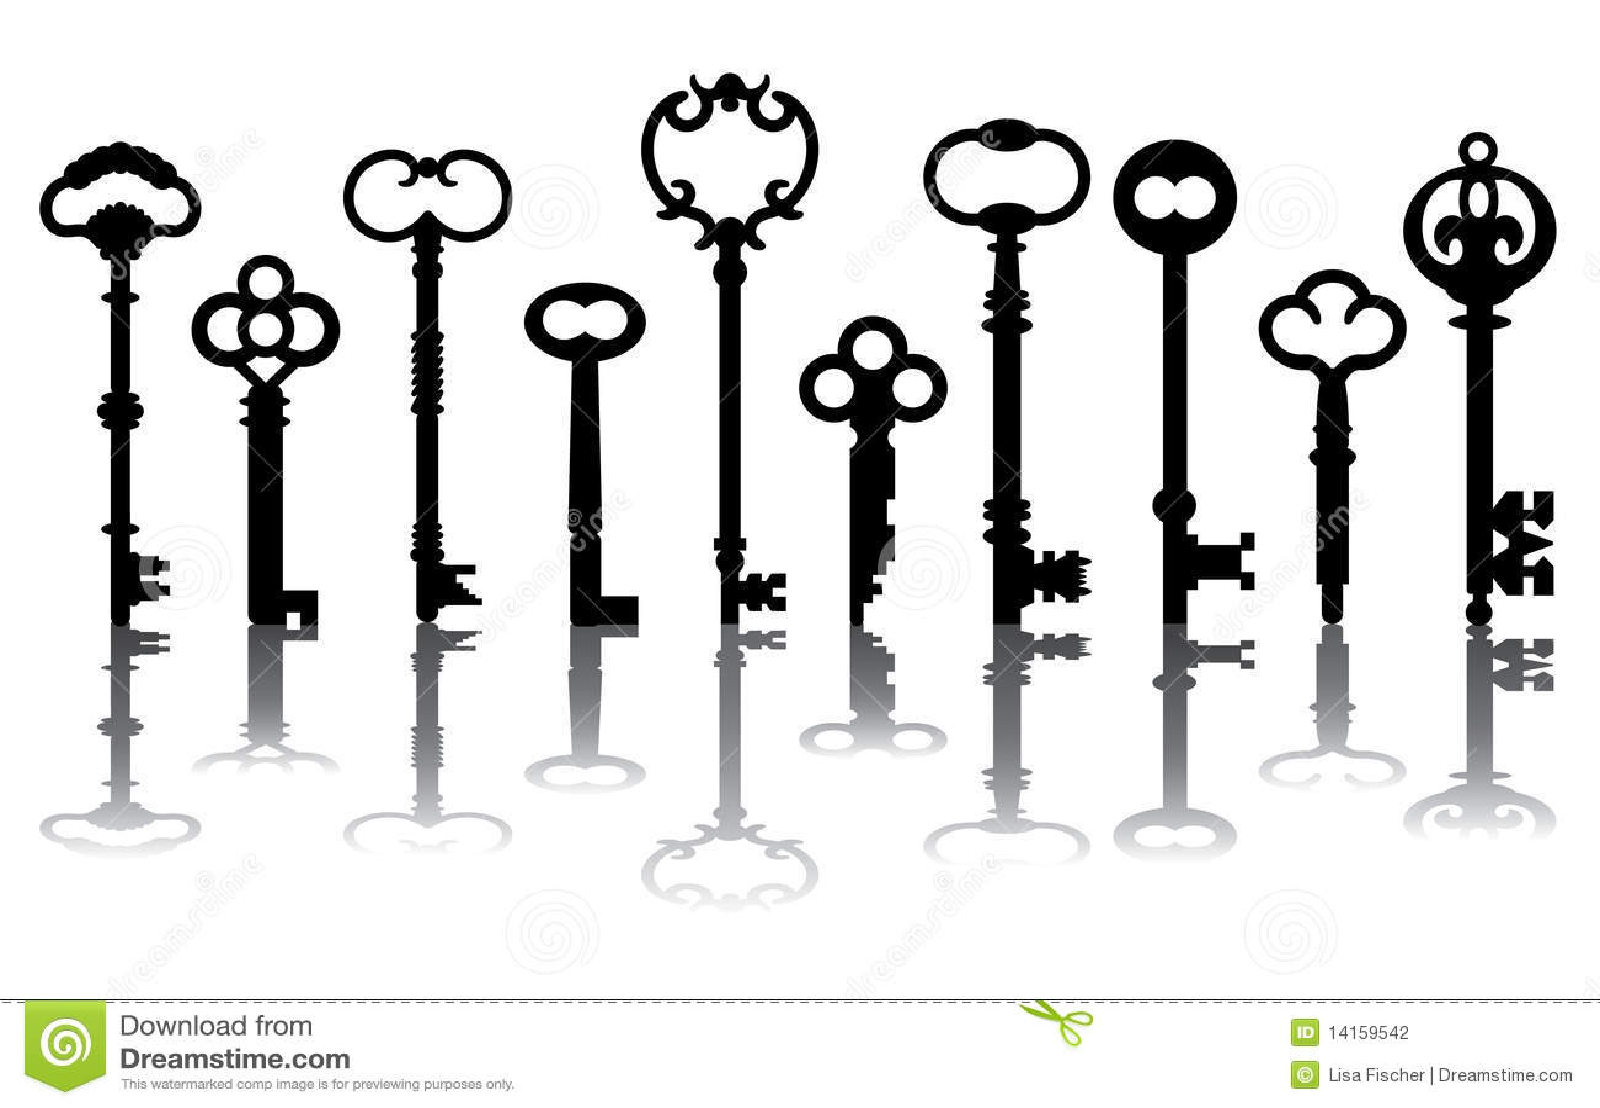 Vintage Key Clip Art Ten Skeleton Key Icons